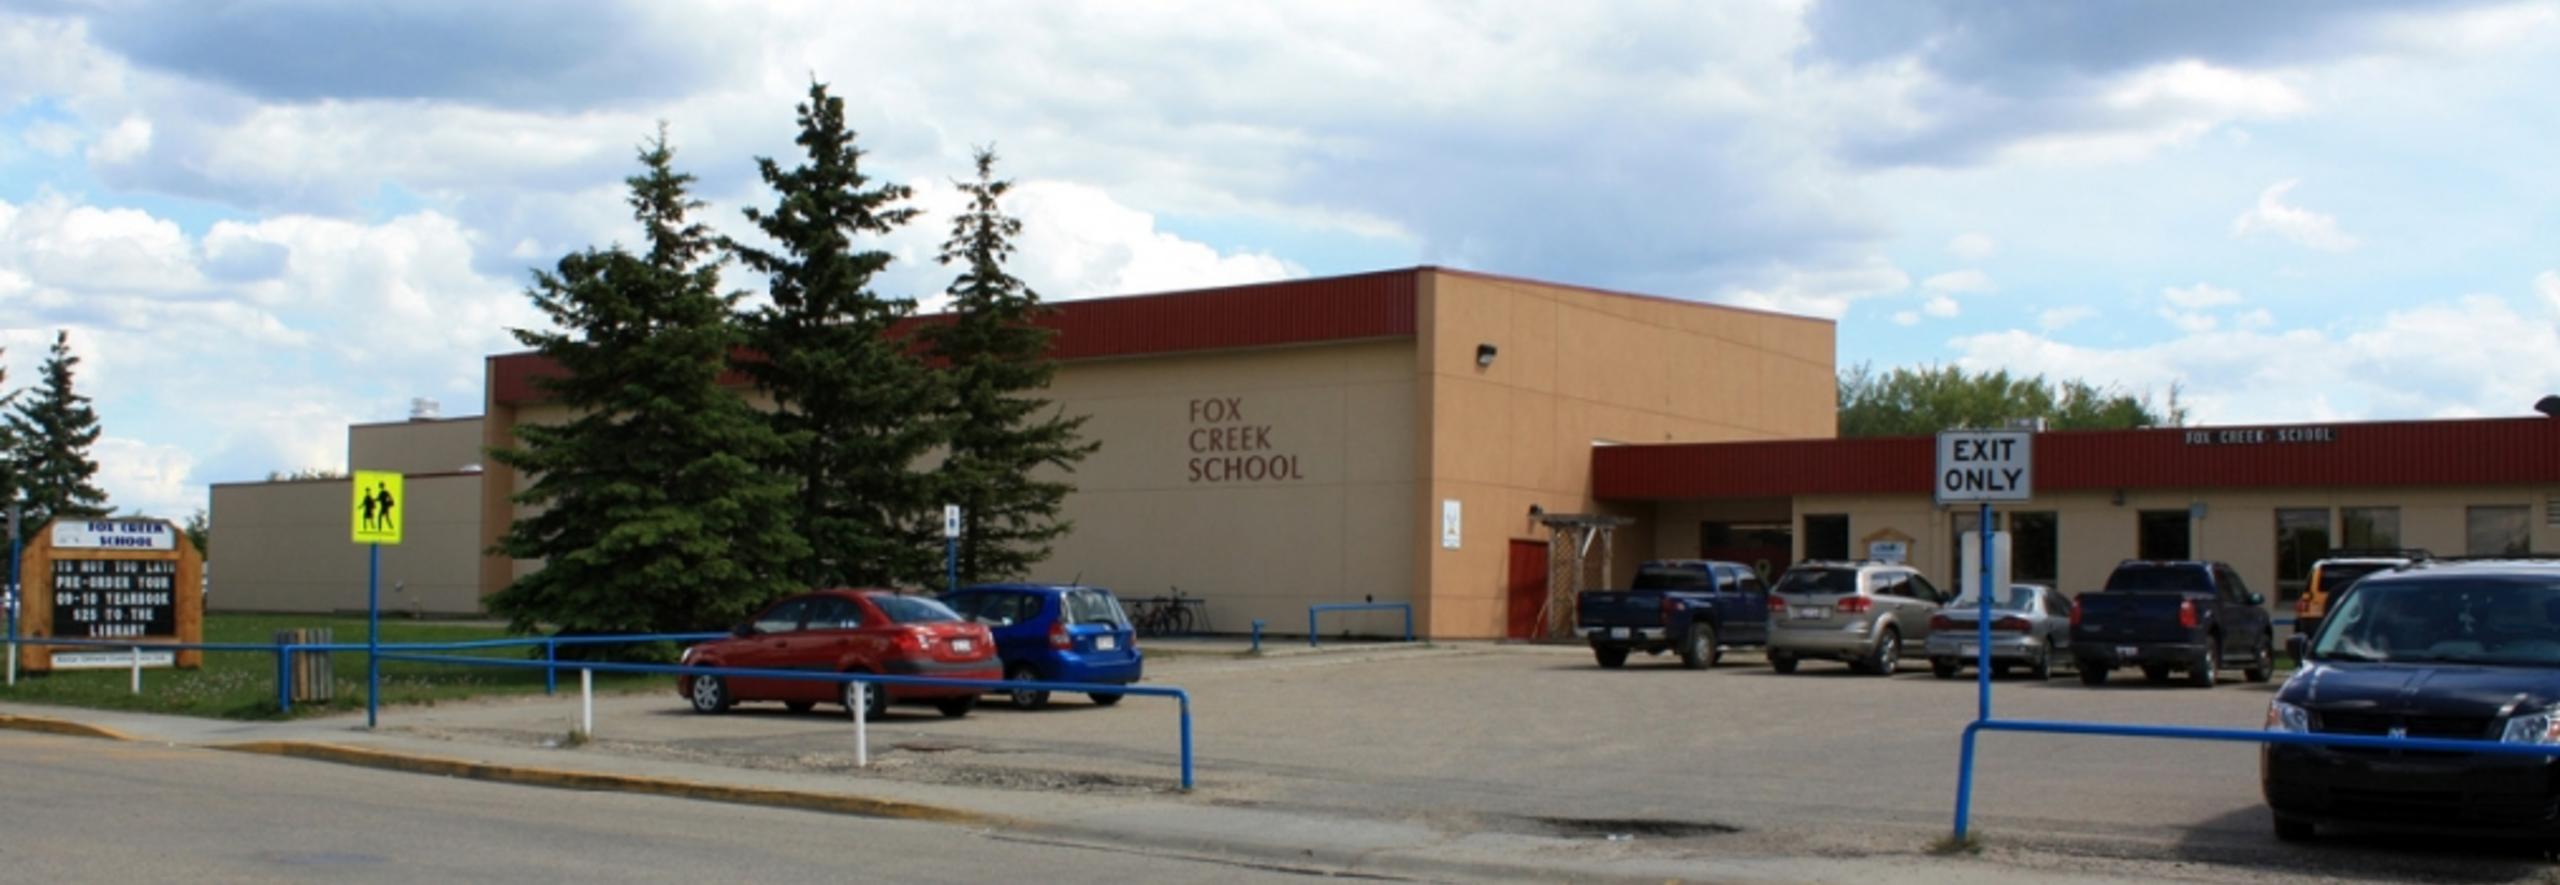 Fox Creek School Banner Photo